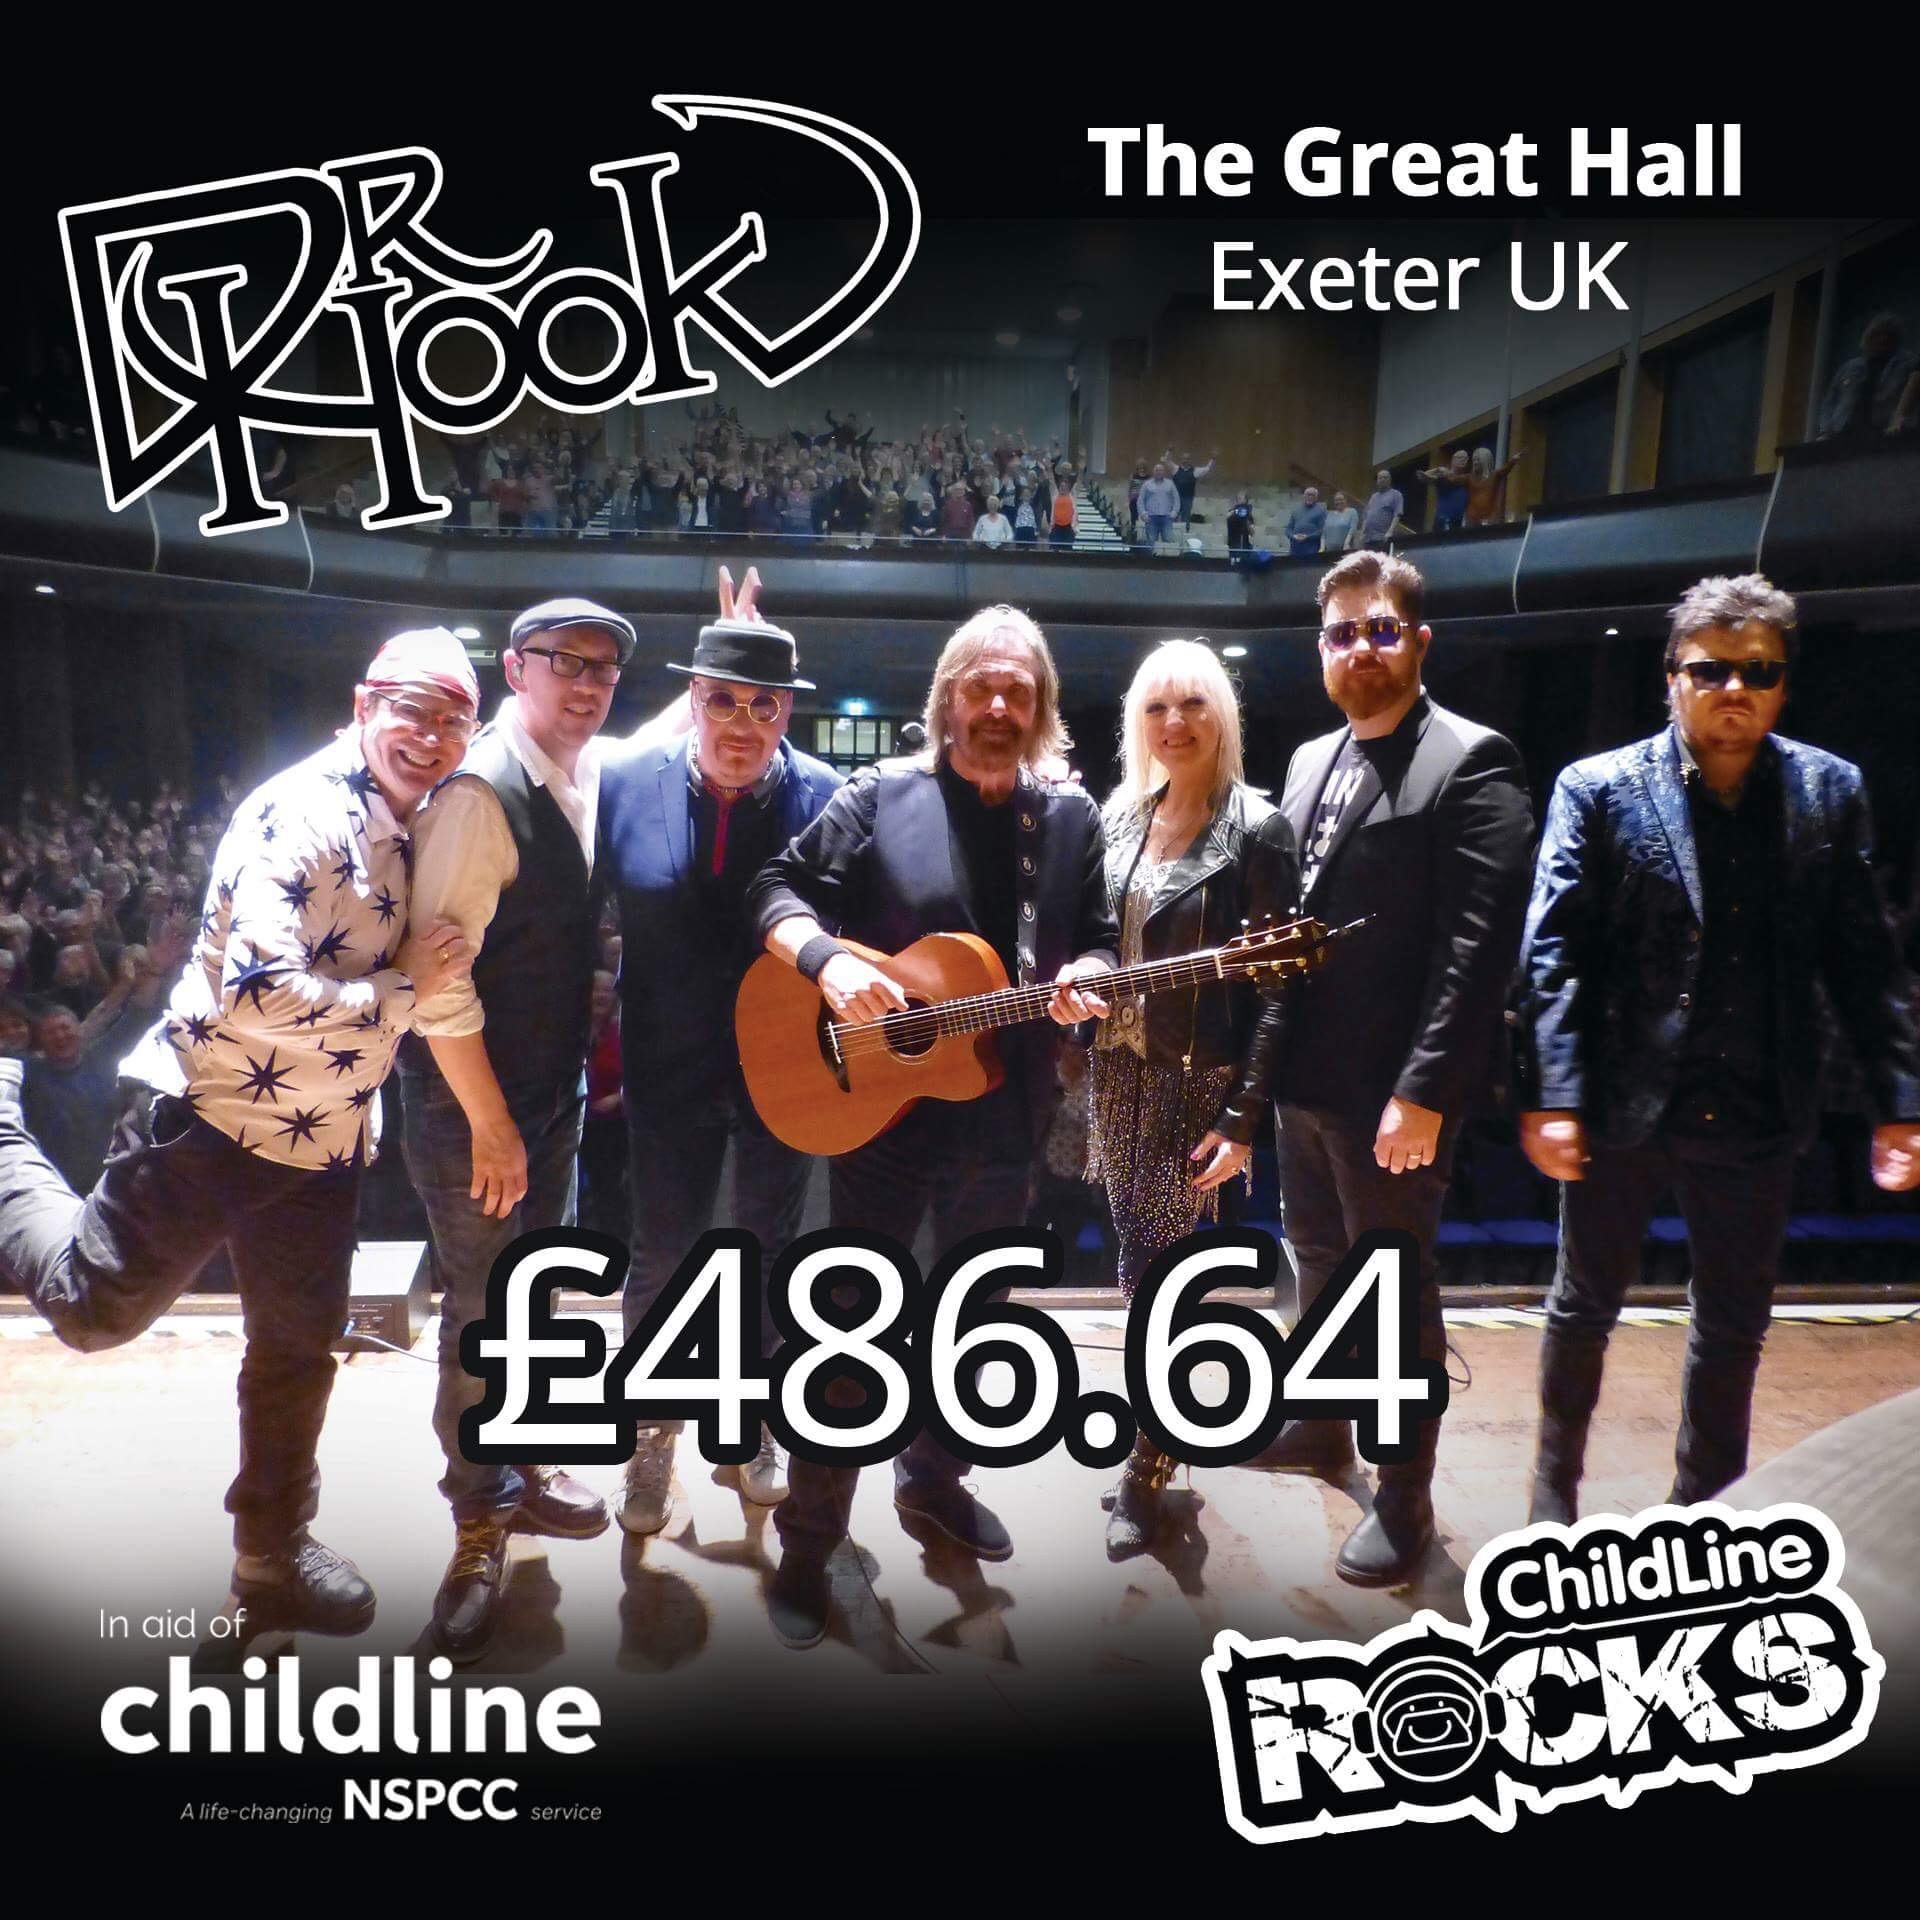 Dr-Hook-Fundraising-NSPCC-Childline-Exeter